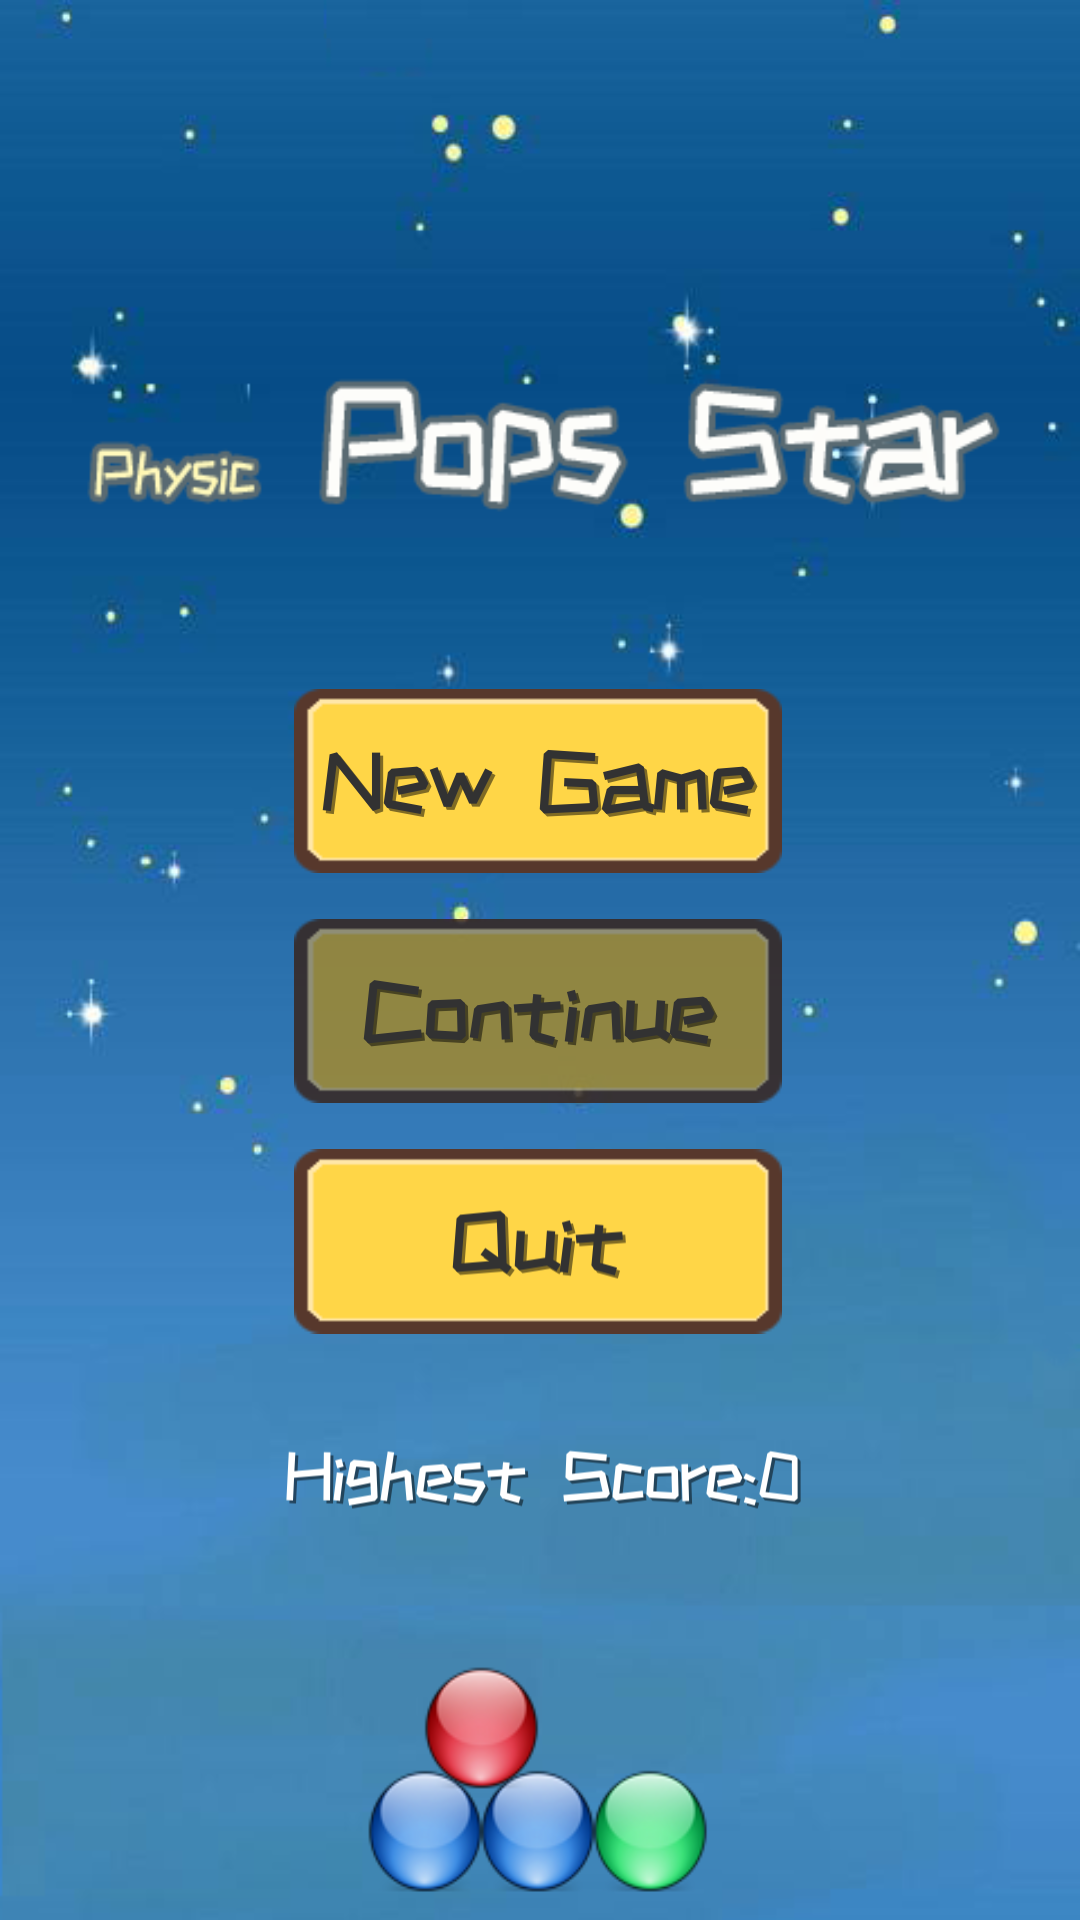 Physics pop star